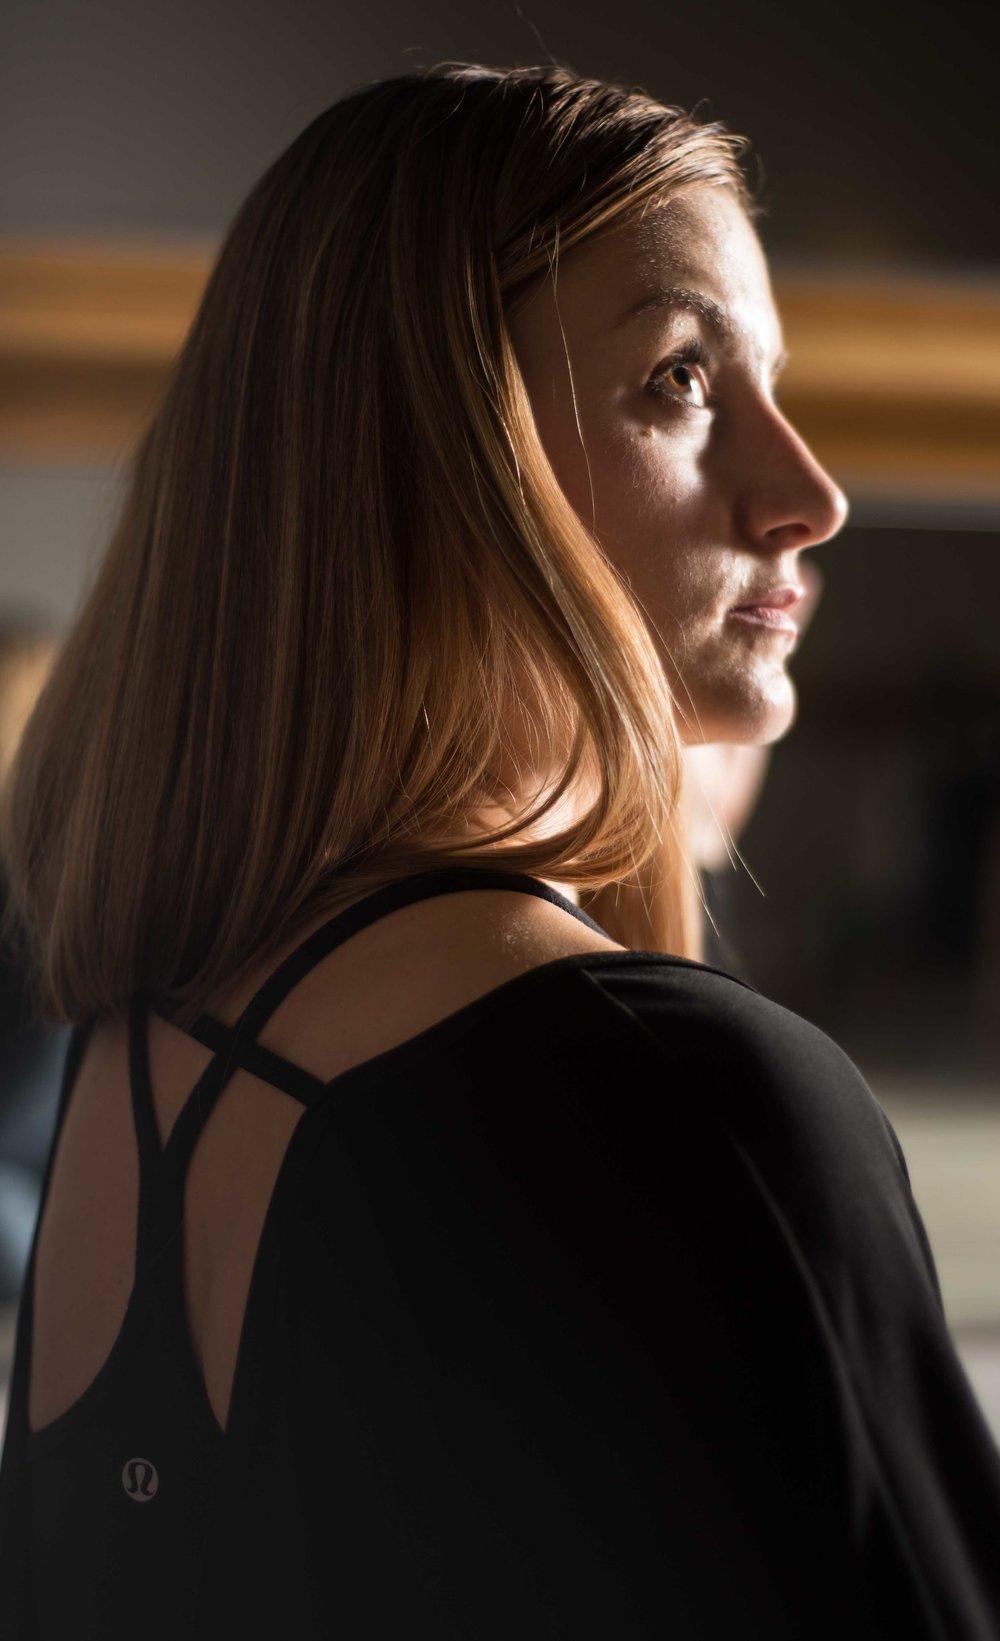 Marzena Wojcik - Urban   Mindful   YoginiPhoto by: Chelsea Lees